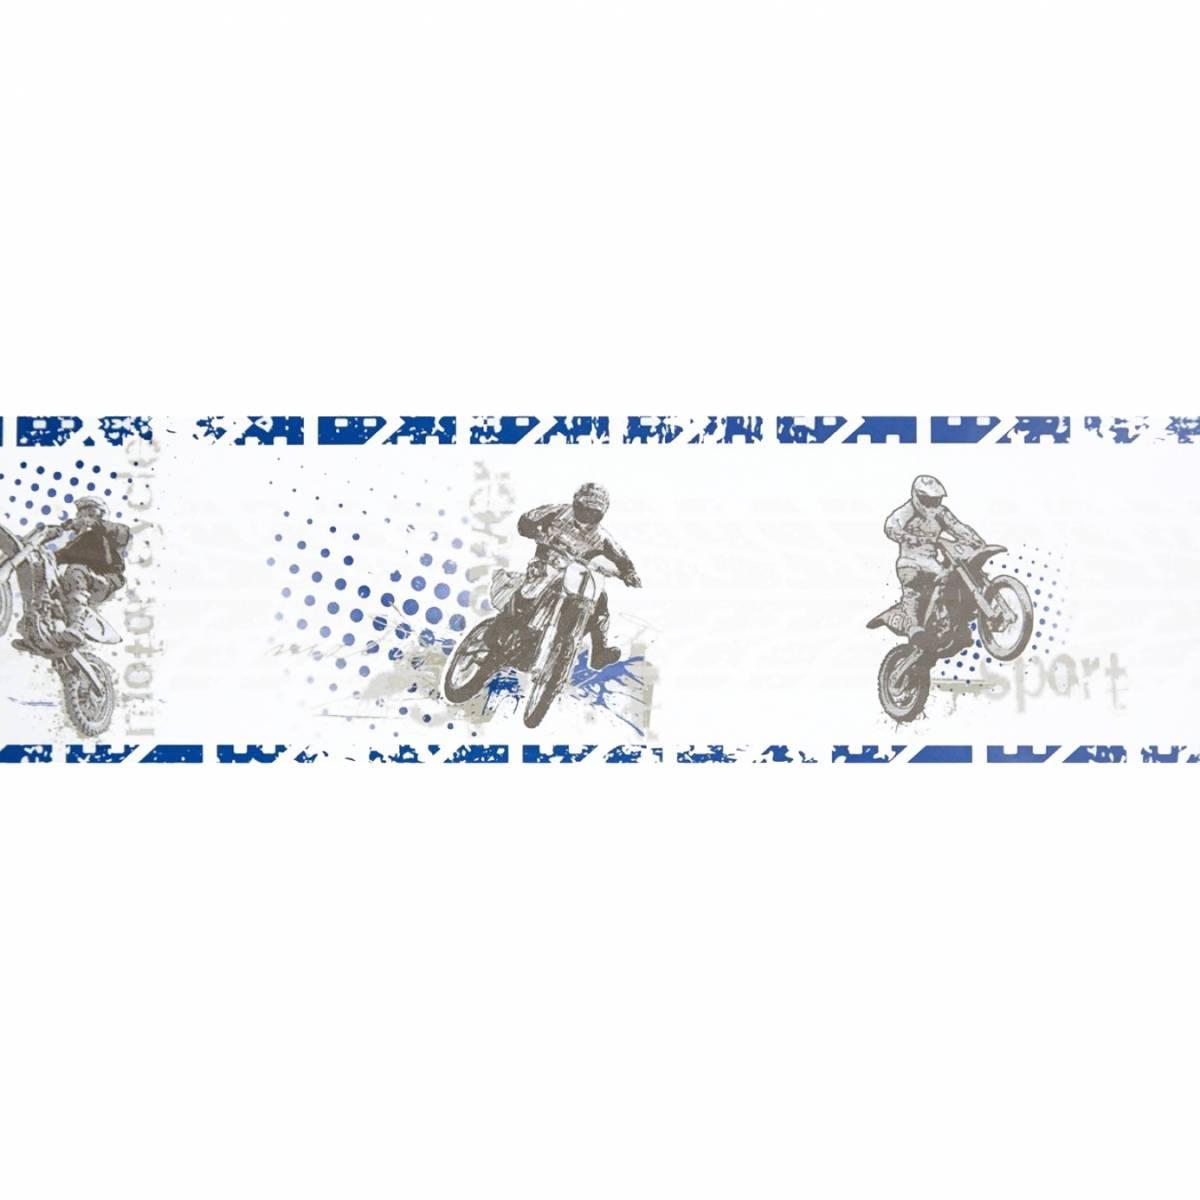 motocross wallpaper border blue 64826050 caselio